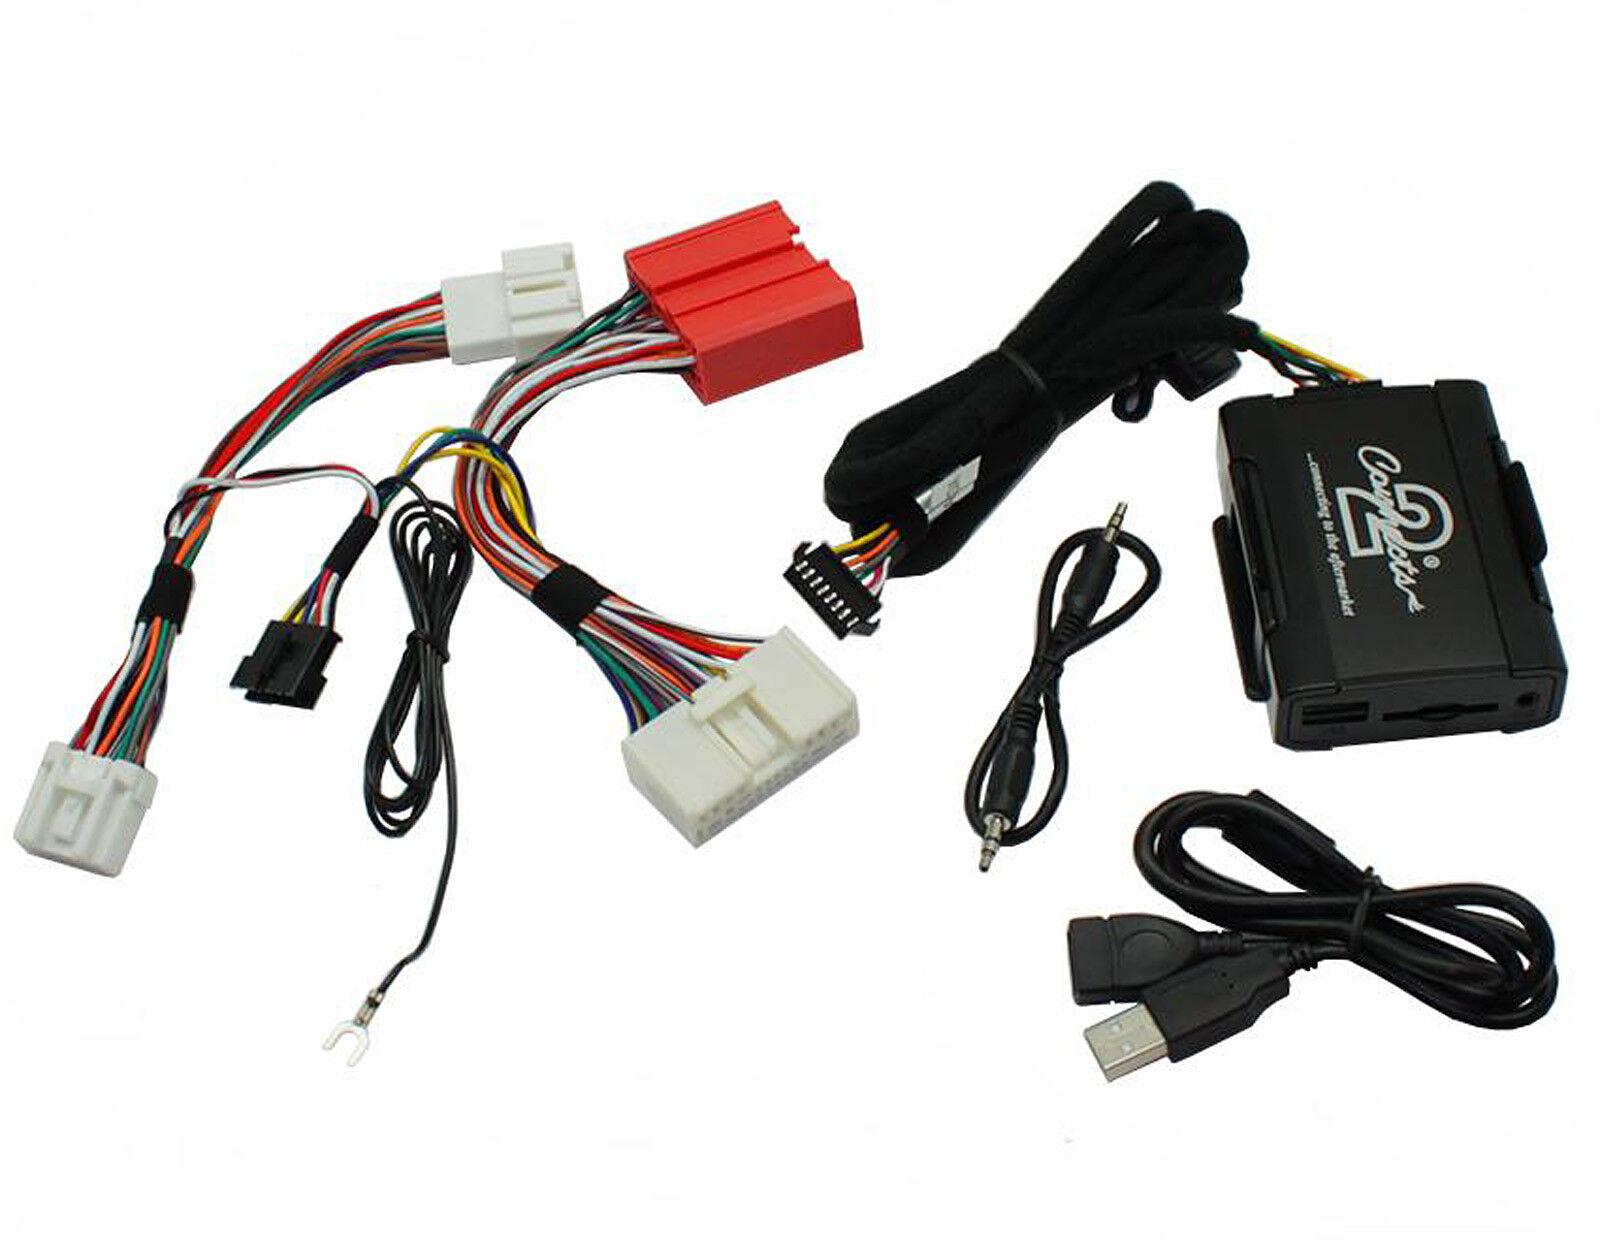 Mazda 3 5 6 USB adapter interface CTAMZUSB002 car AUX SD input MP3 jack 2009 on>